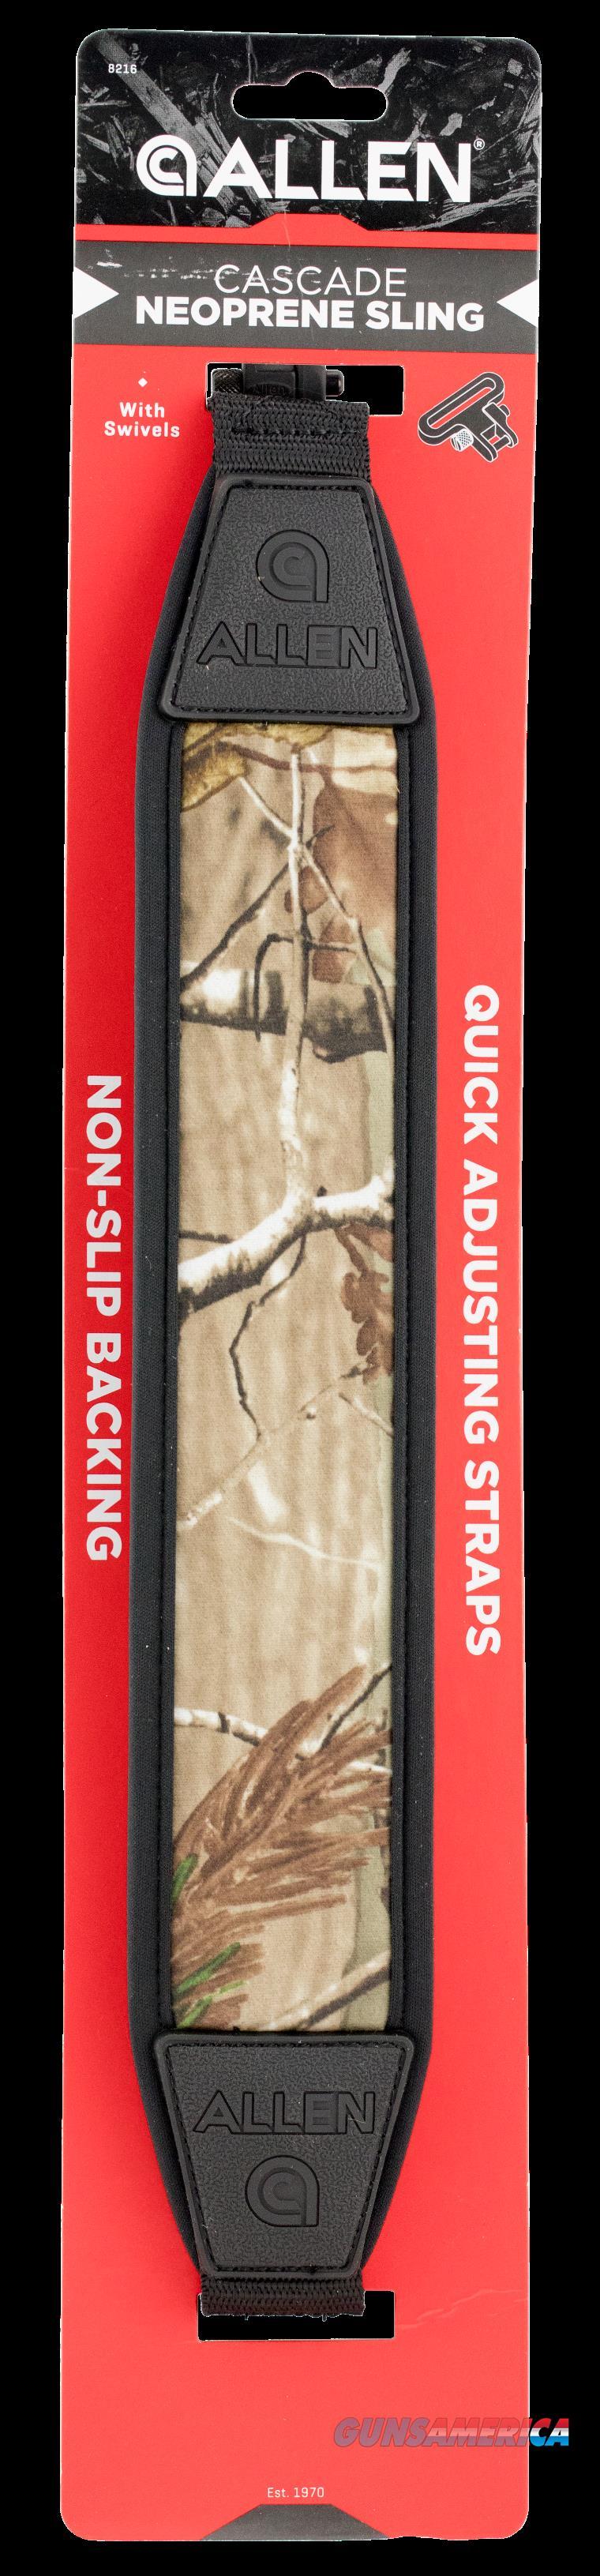 Allen Cascade, Allen 8216 Cascade Sling W-swvls Rap  Guns > Pistols > 1911 Pistol Copies (non-Colt)